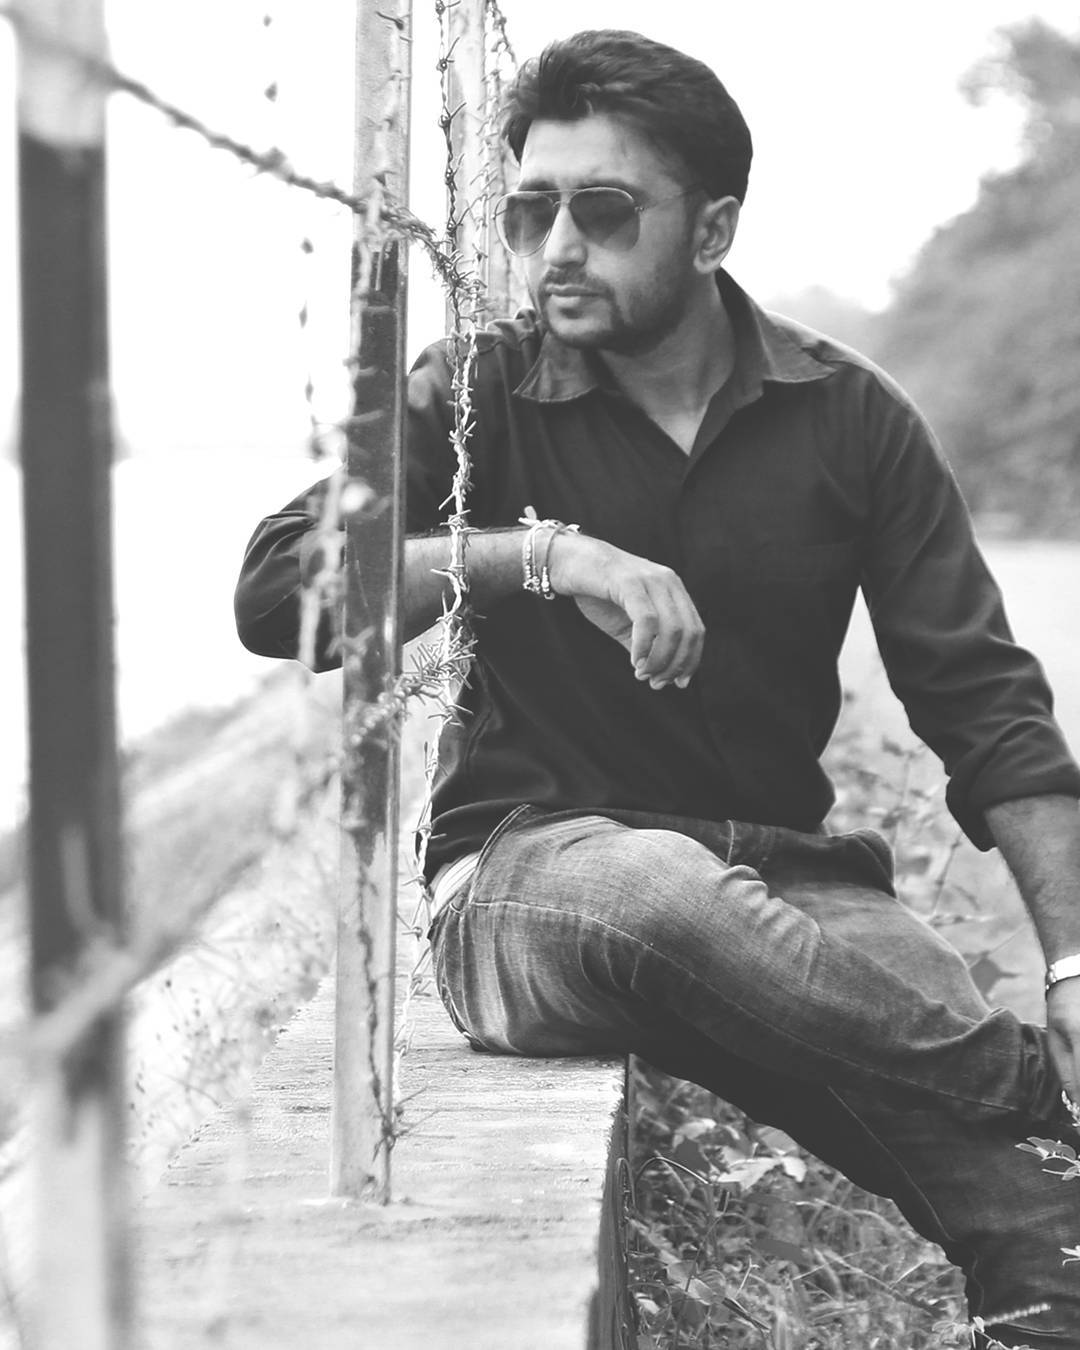 """When I let go of what I am, I become what I might be."" @dip_memento_photography  #ahmedabadfashion #ahmedabadfashionblogger #ahmedabad #selfie #photoholic #fashion #fashionlover #fashionblogger #fashionblog #ahmedabadshoutout #instamood #instapose #instaposemaker #gujaratboys #gujaratfashion #fashionphotography #candidphotography #portraitphotography #FashionShoot #fashionphotography #fashionista #portfolioshoot #indianfashionblogger #fashionblogger #fashionphotographer #profession #hobby #AhmedabadPhotography  #DipsPhotography | #MementoaPhotography"